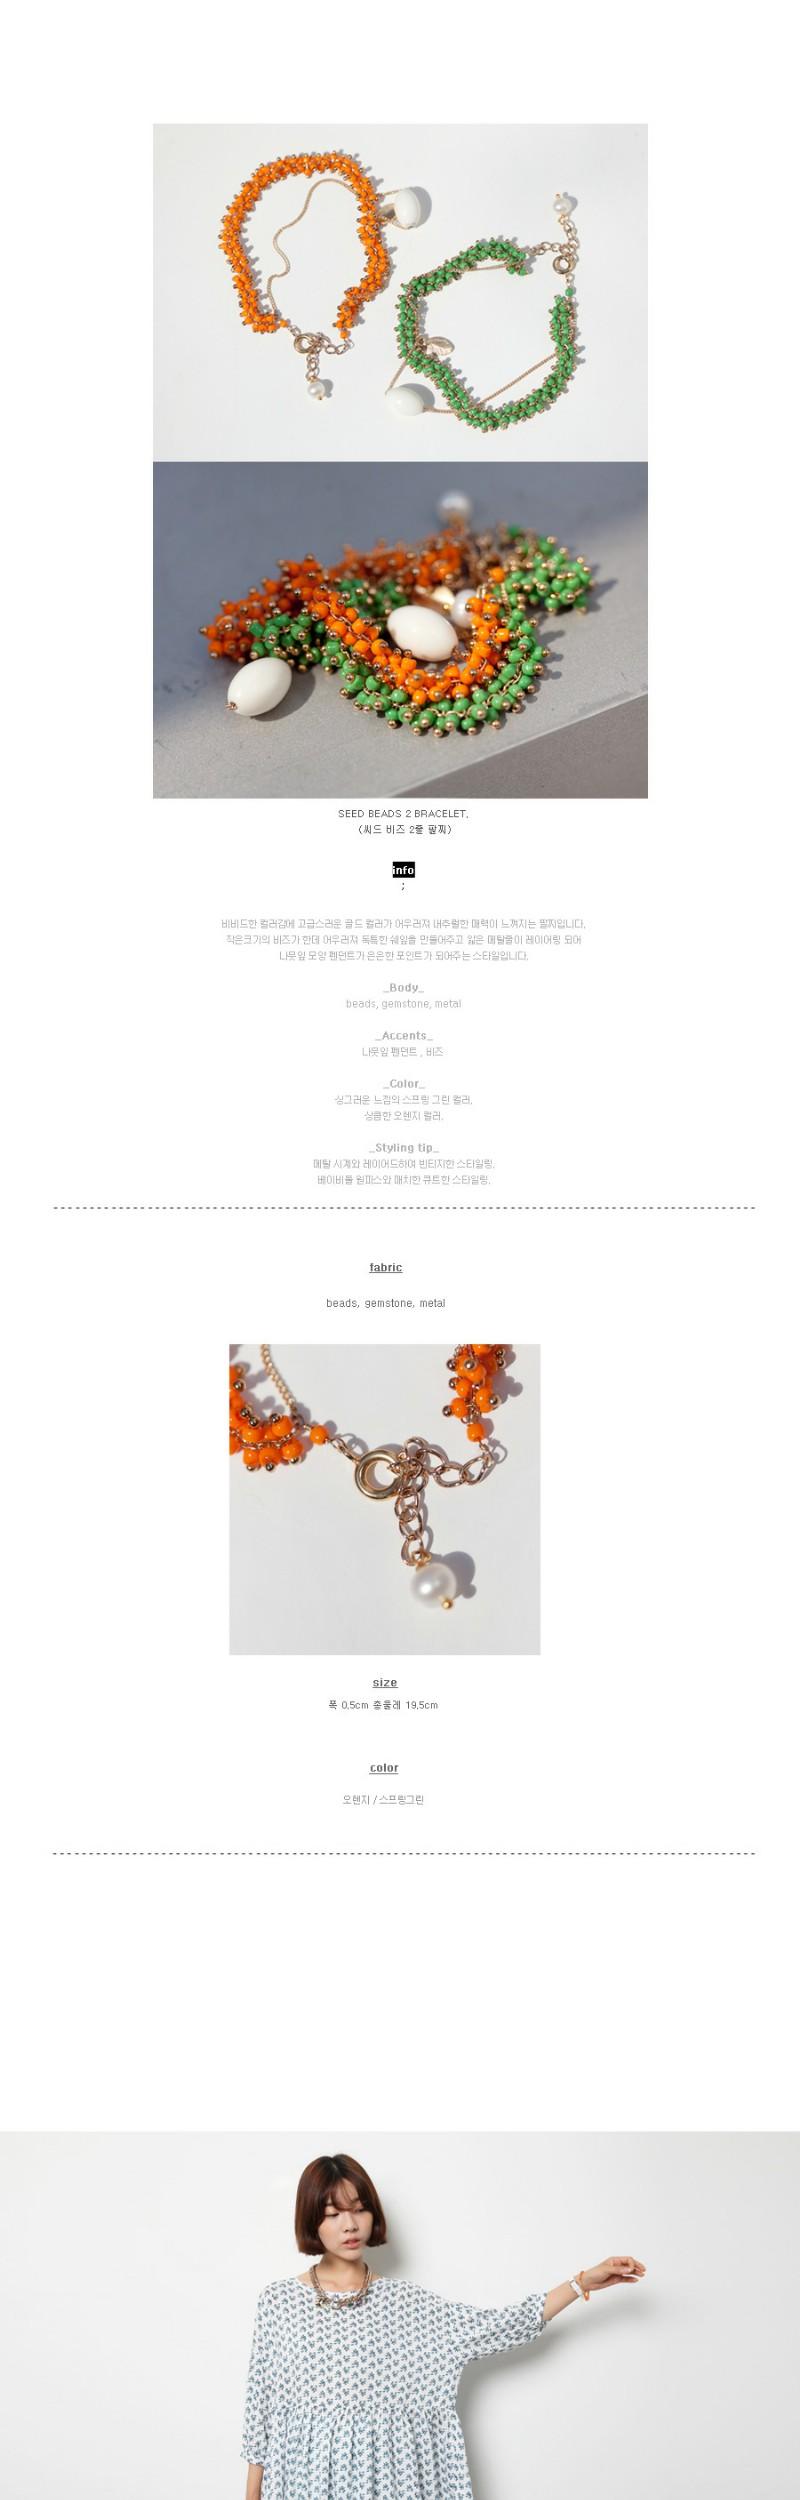 Seed beads 2 bracelet